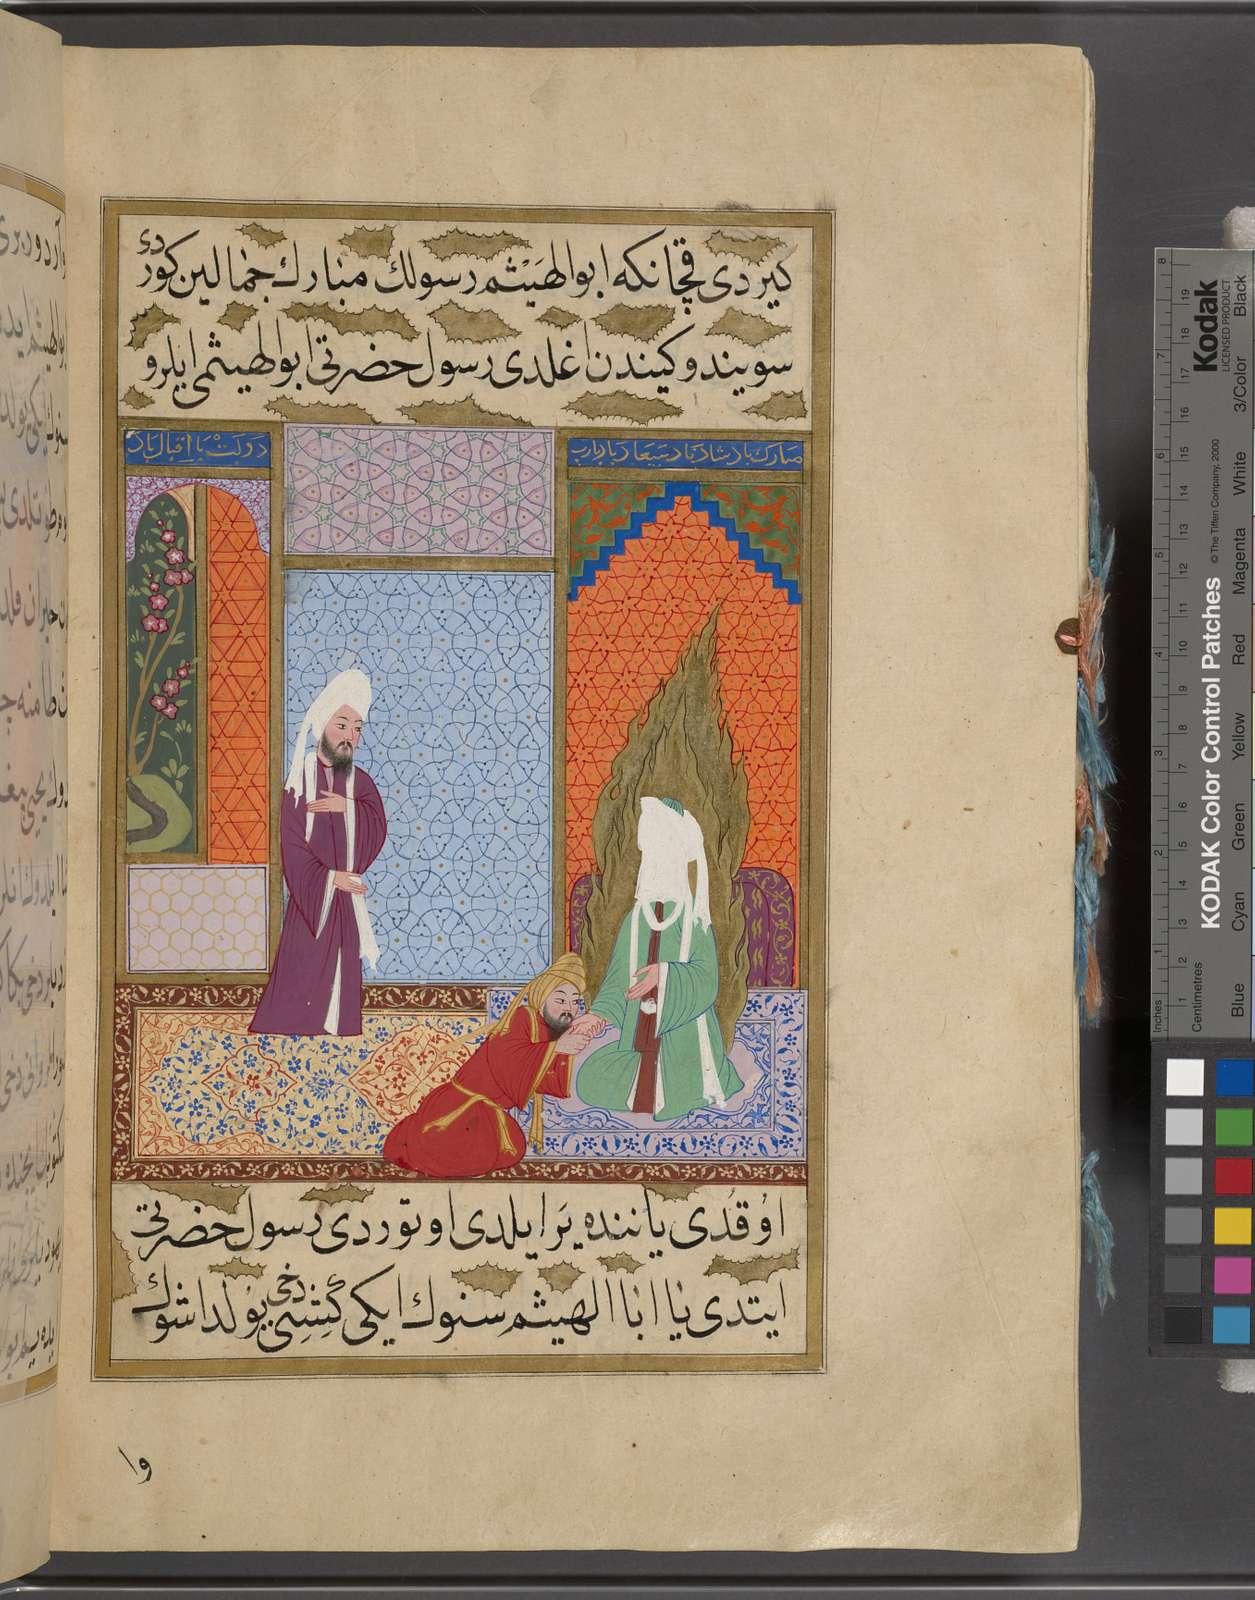 Abû Hishâm of Medina kisses the hand of the Prophet.